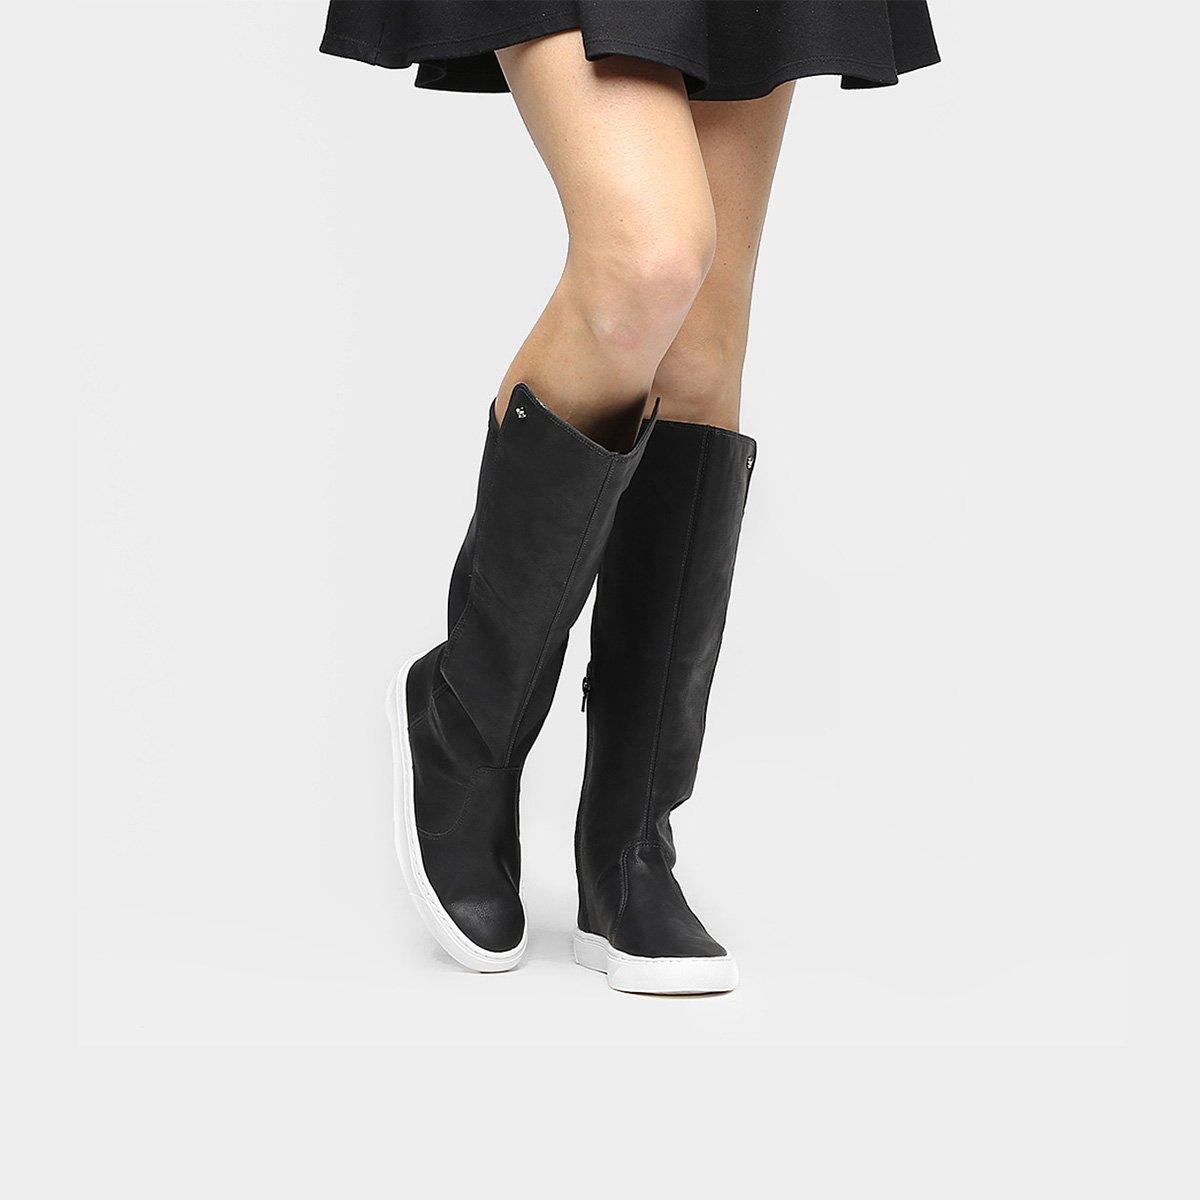 588995377 Bota Over The Knee Comfortflex Cravo & Canela Feminina | Zattini